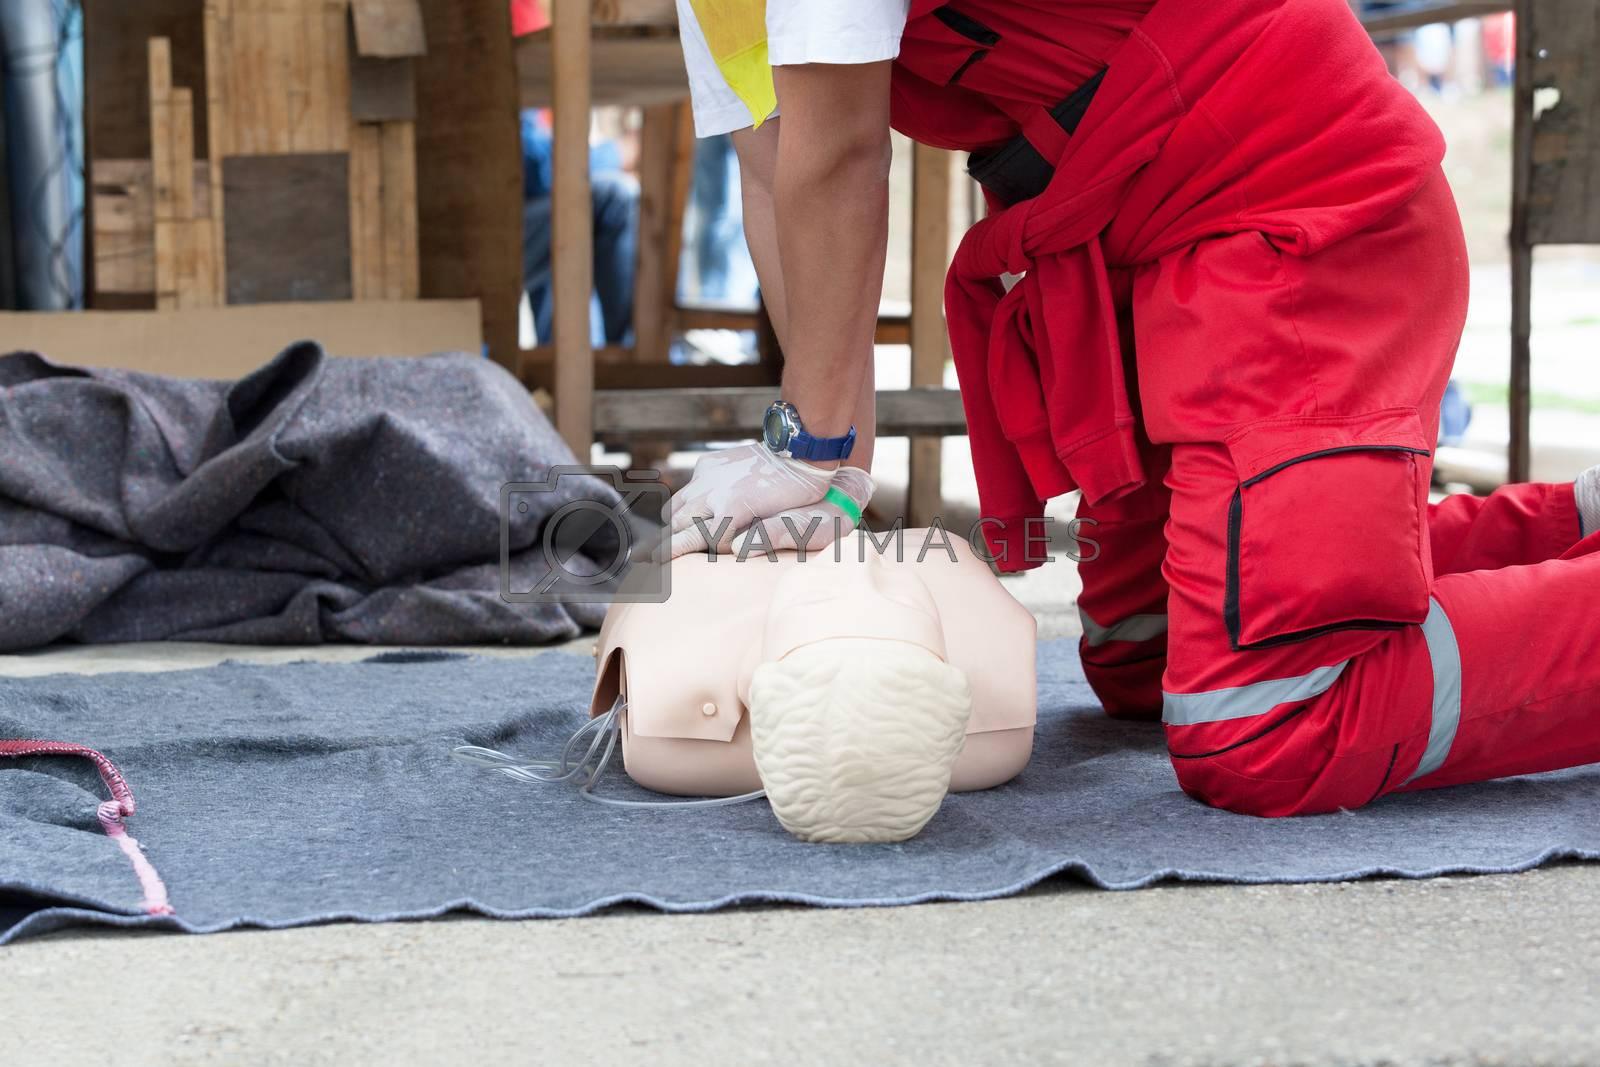 First aid training detail. Cardiopulmonary resuscitation - CPR.